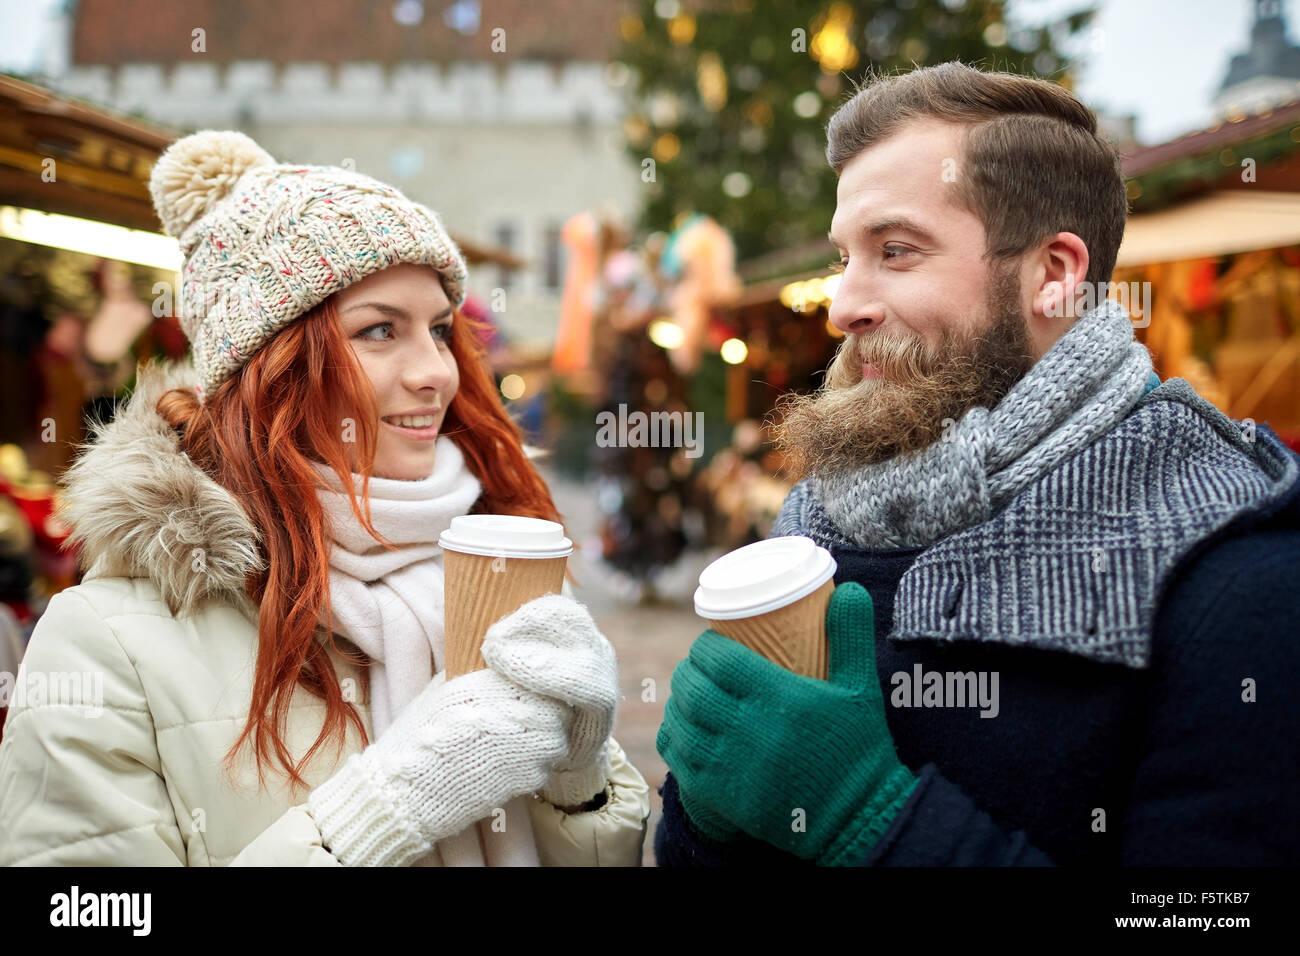 glückliches Paar Kaffeetrinken auf Altstadt Straße Stockbild